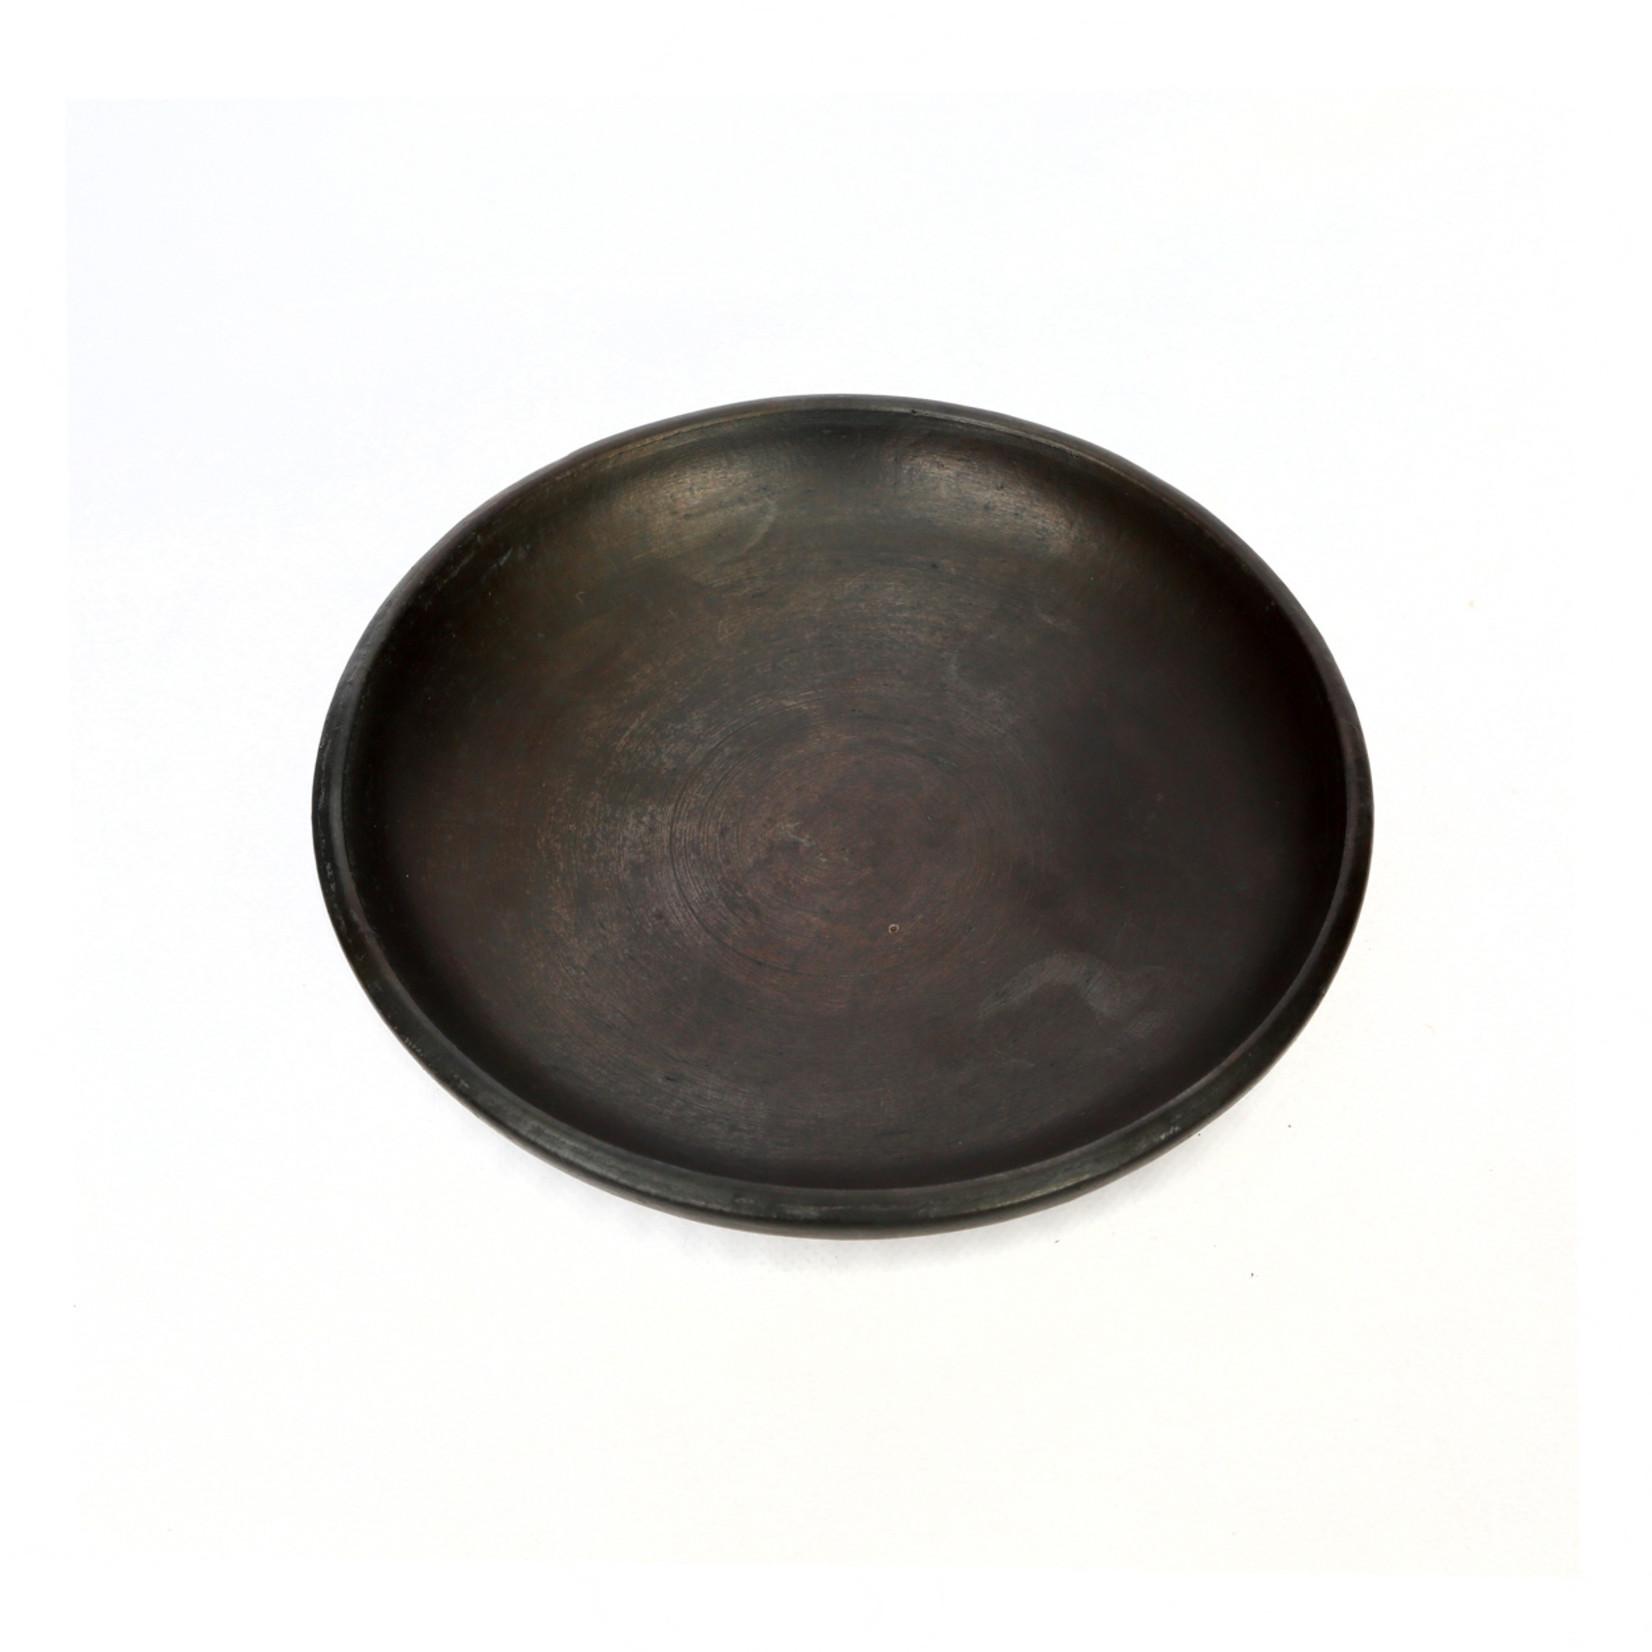 Bazar Bizar The Burned Classic Plate - Black - M